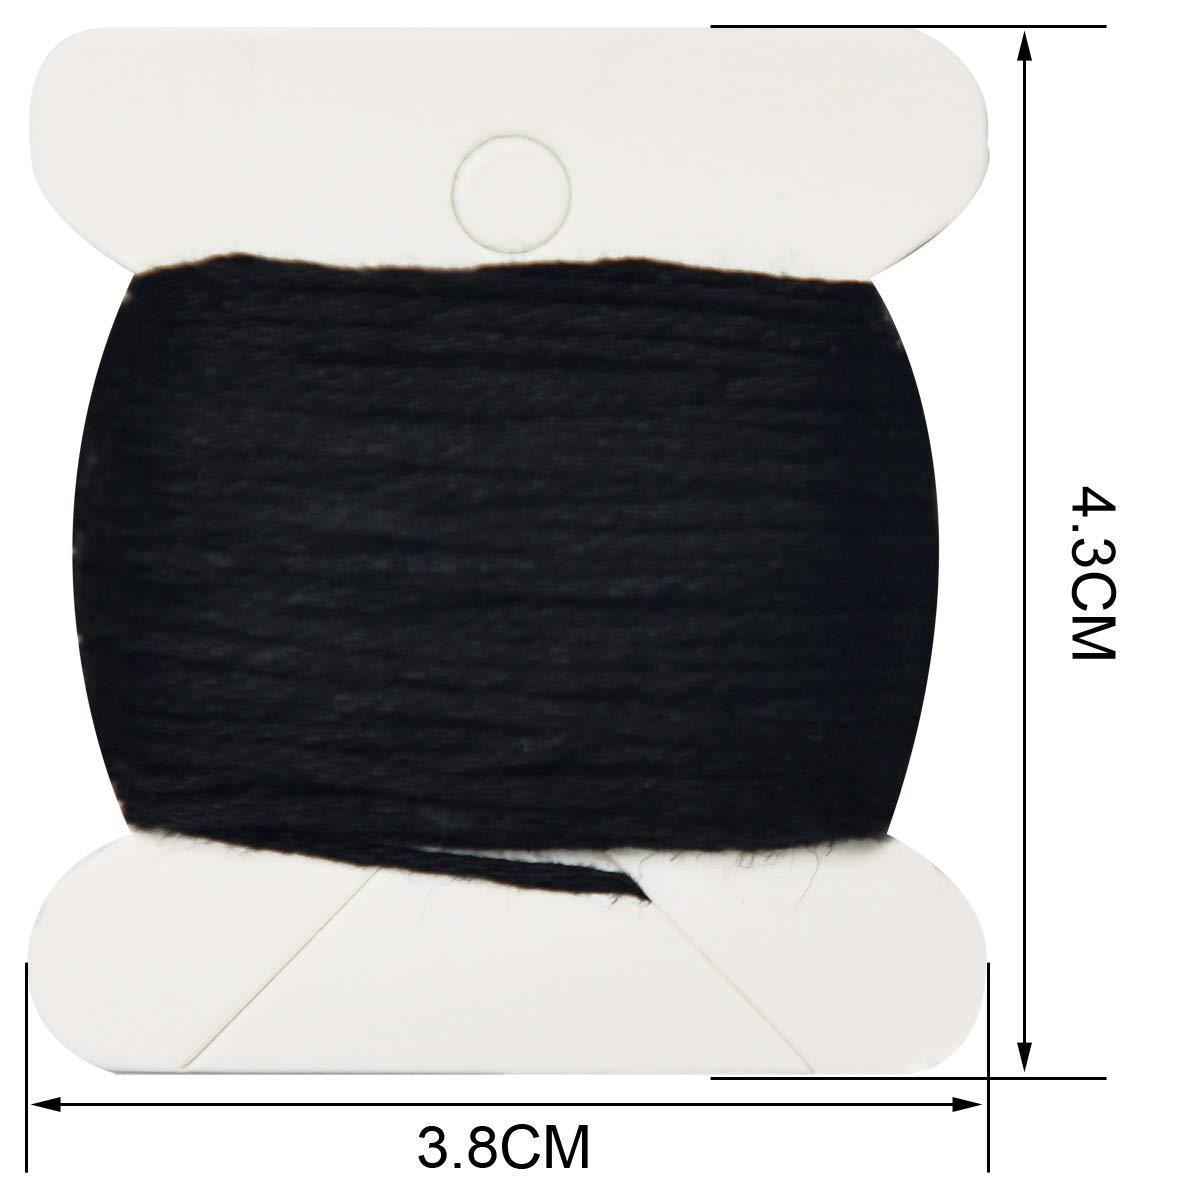 Premium Orange Series Embroidery Floss-Cross Stitch Threads-Friendship Bracelets Floss-Crafts Floss-Hand Embroidery Thread 24 Skeins Per Pack and Free Set of 3Embroidery Needles and 2 Needle Threader